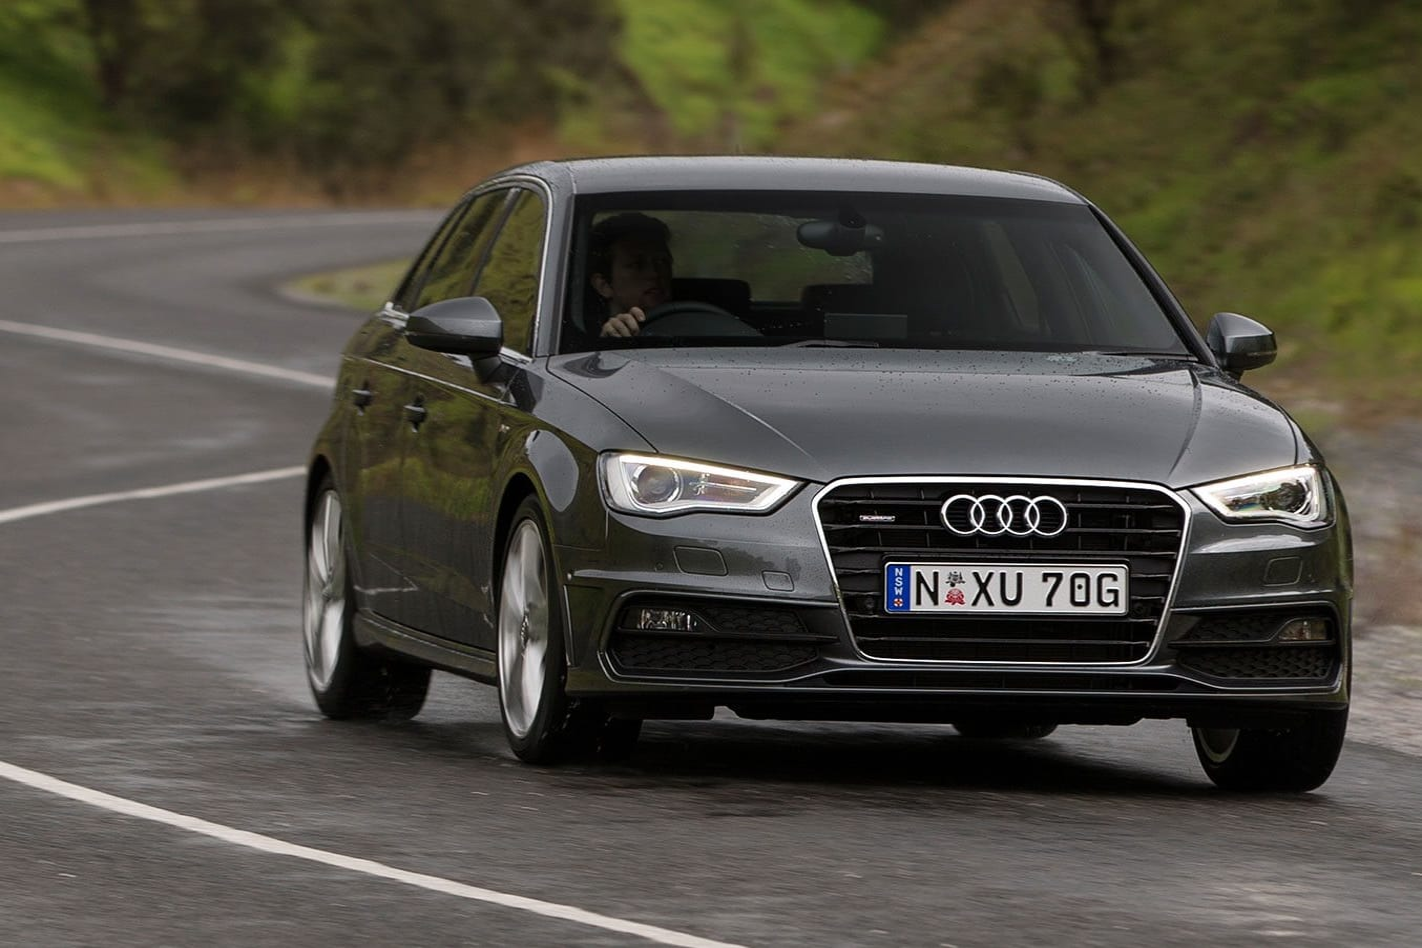 Audi A 3 Sportback 1 8 TFSI Drive 3 Audi 1 Jpg